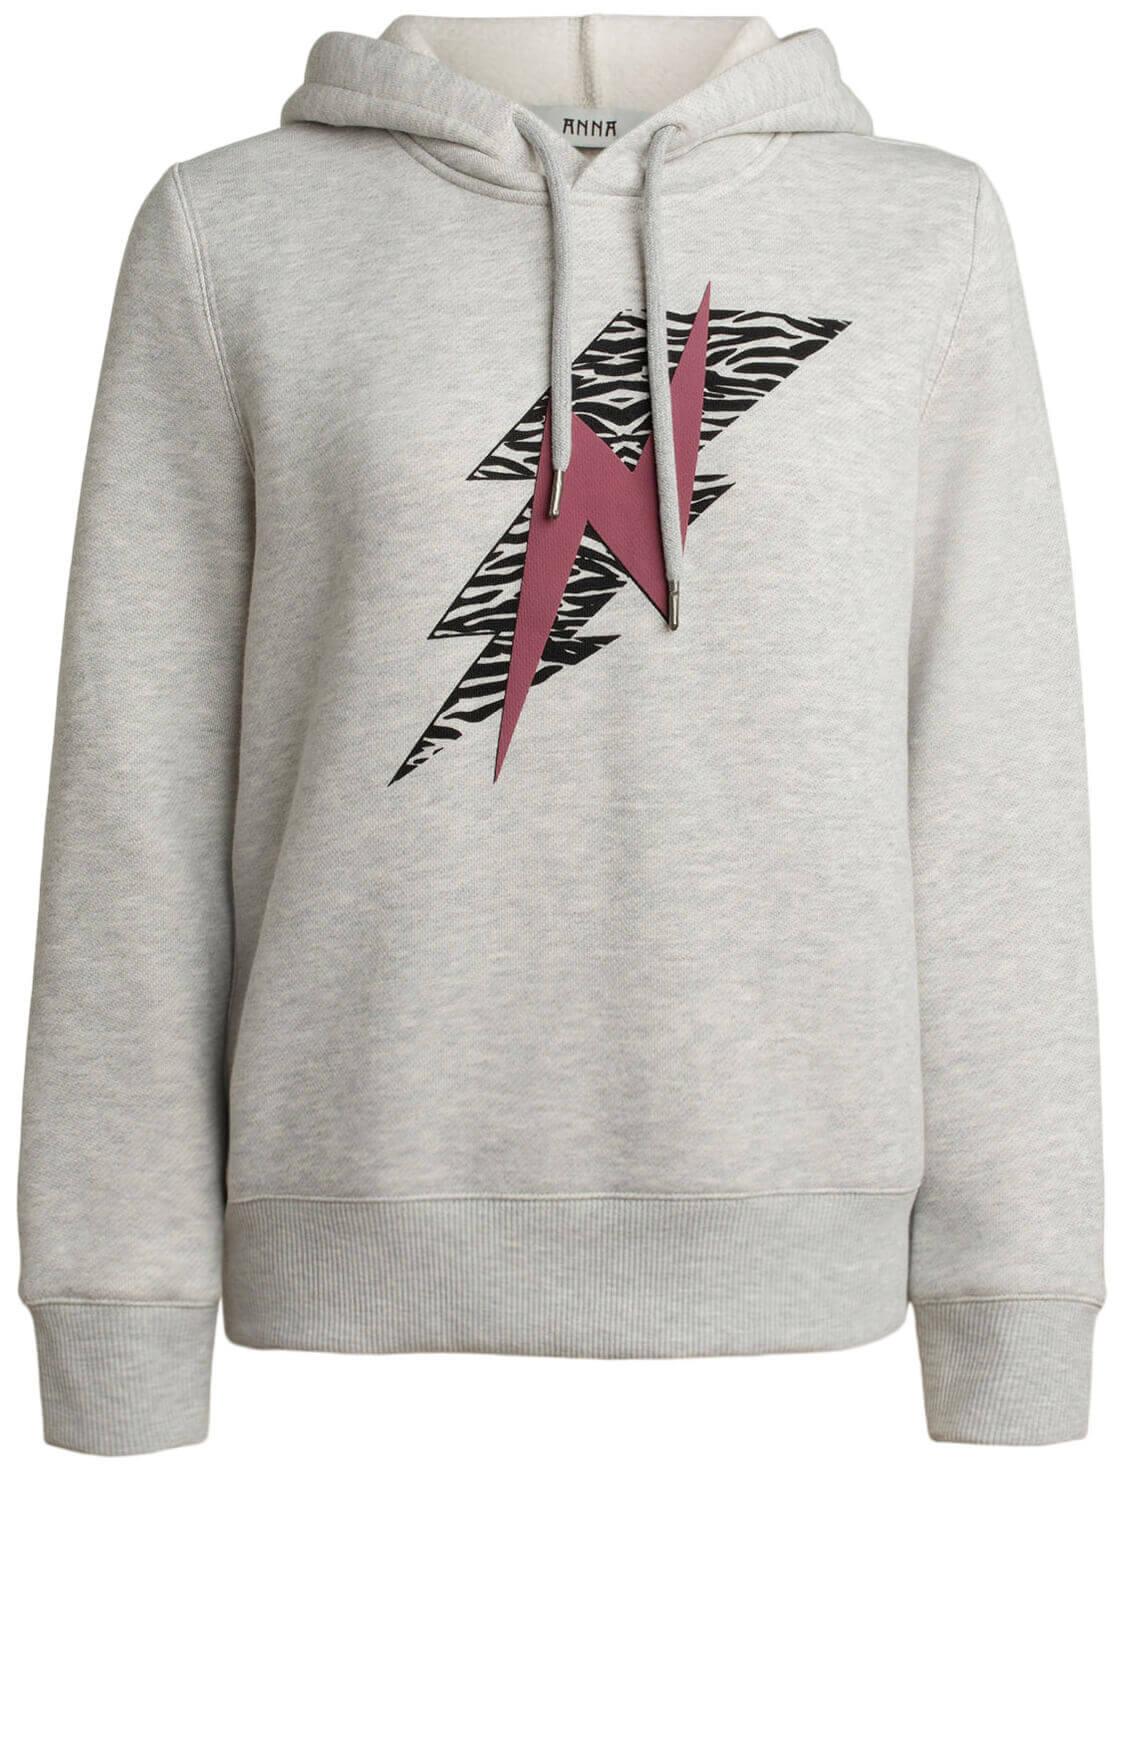 Anna Dames Bliksem sweater Grijs